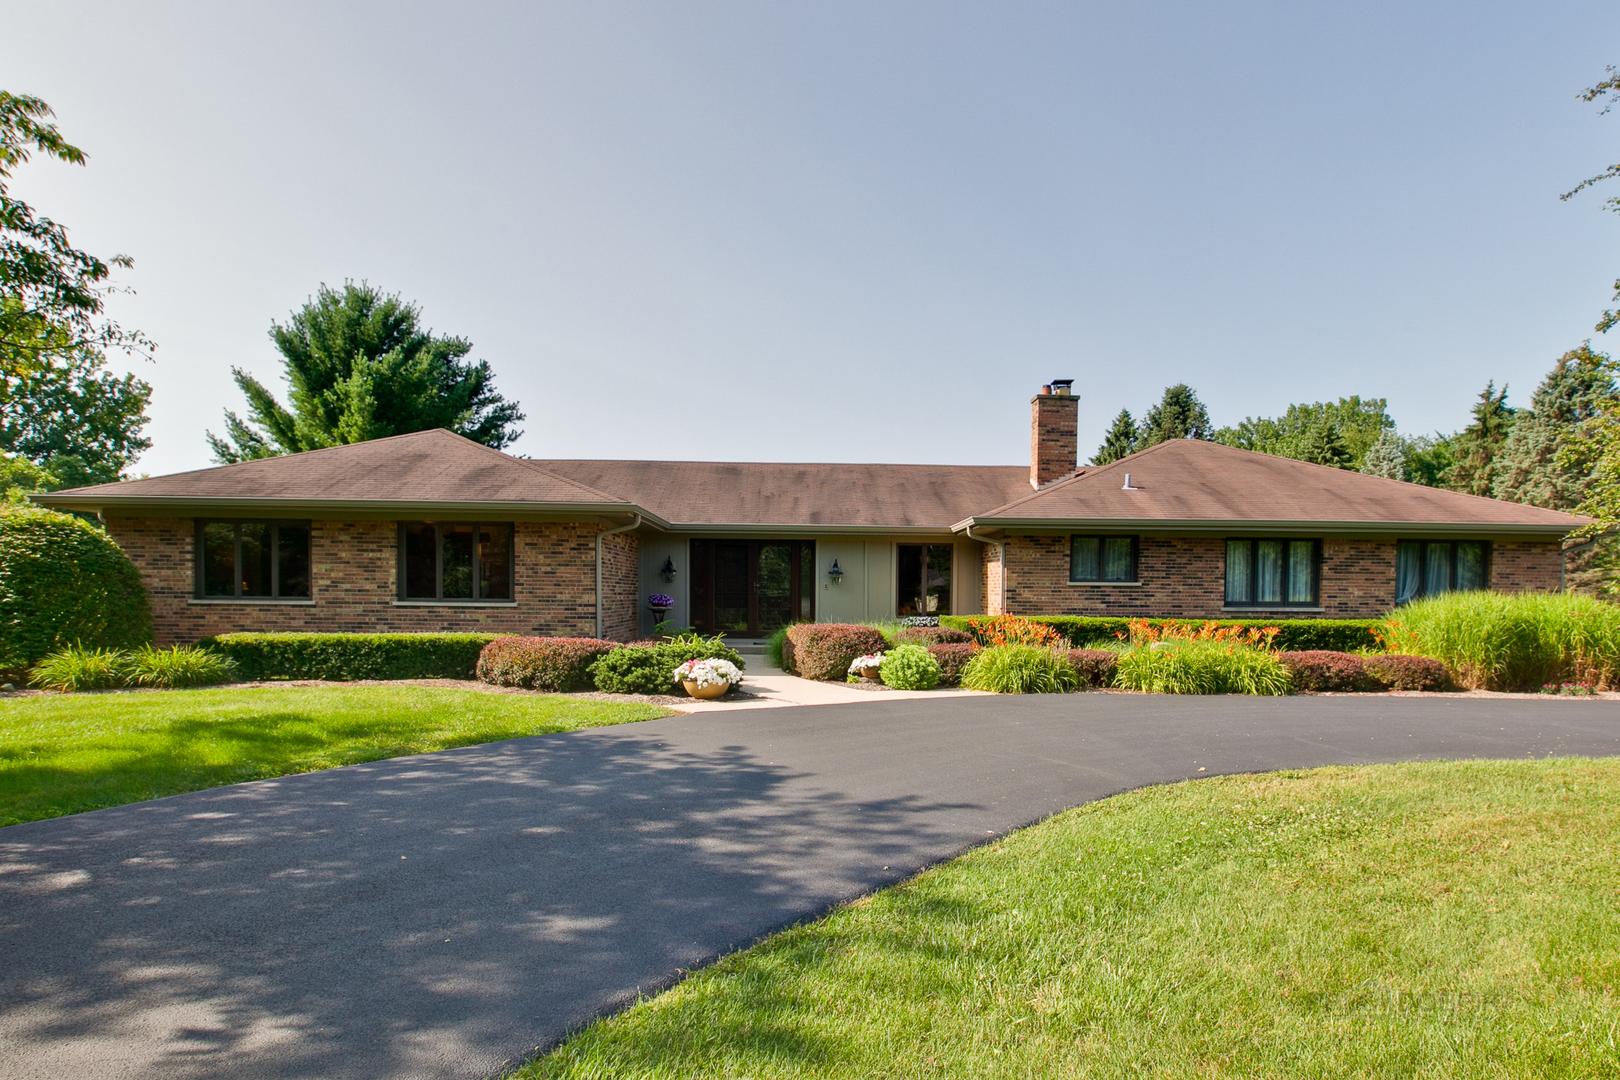 6716 Indian Lane, Long Grove, Illinois 60047